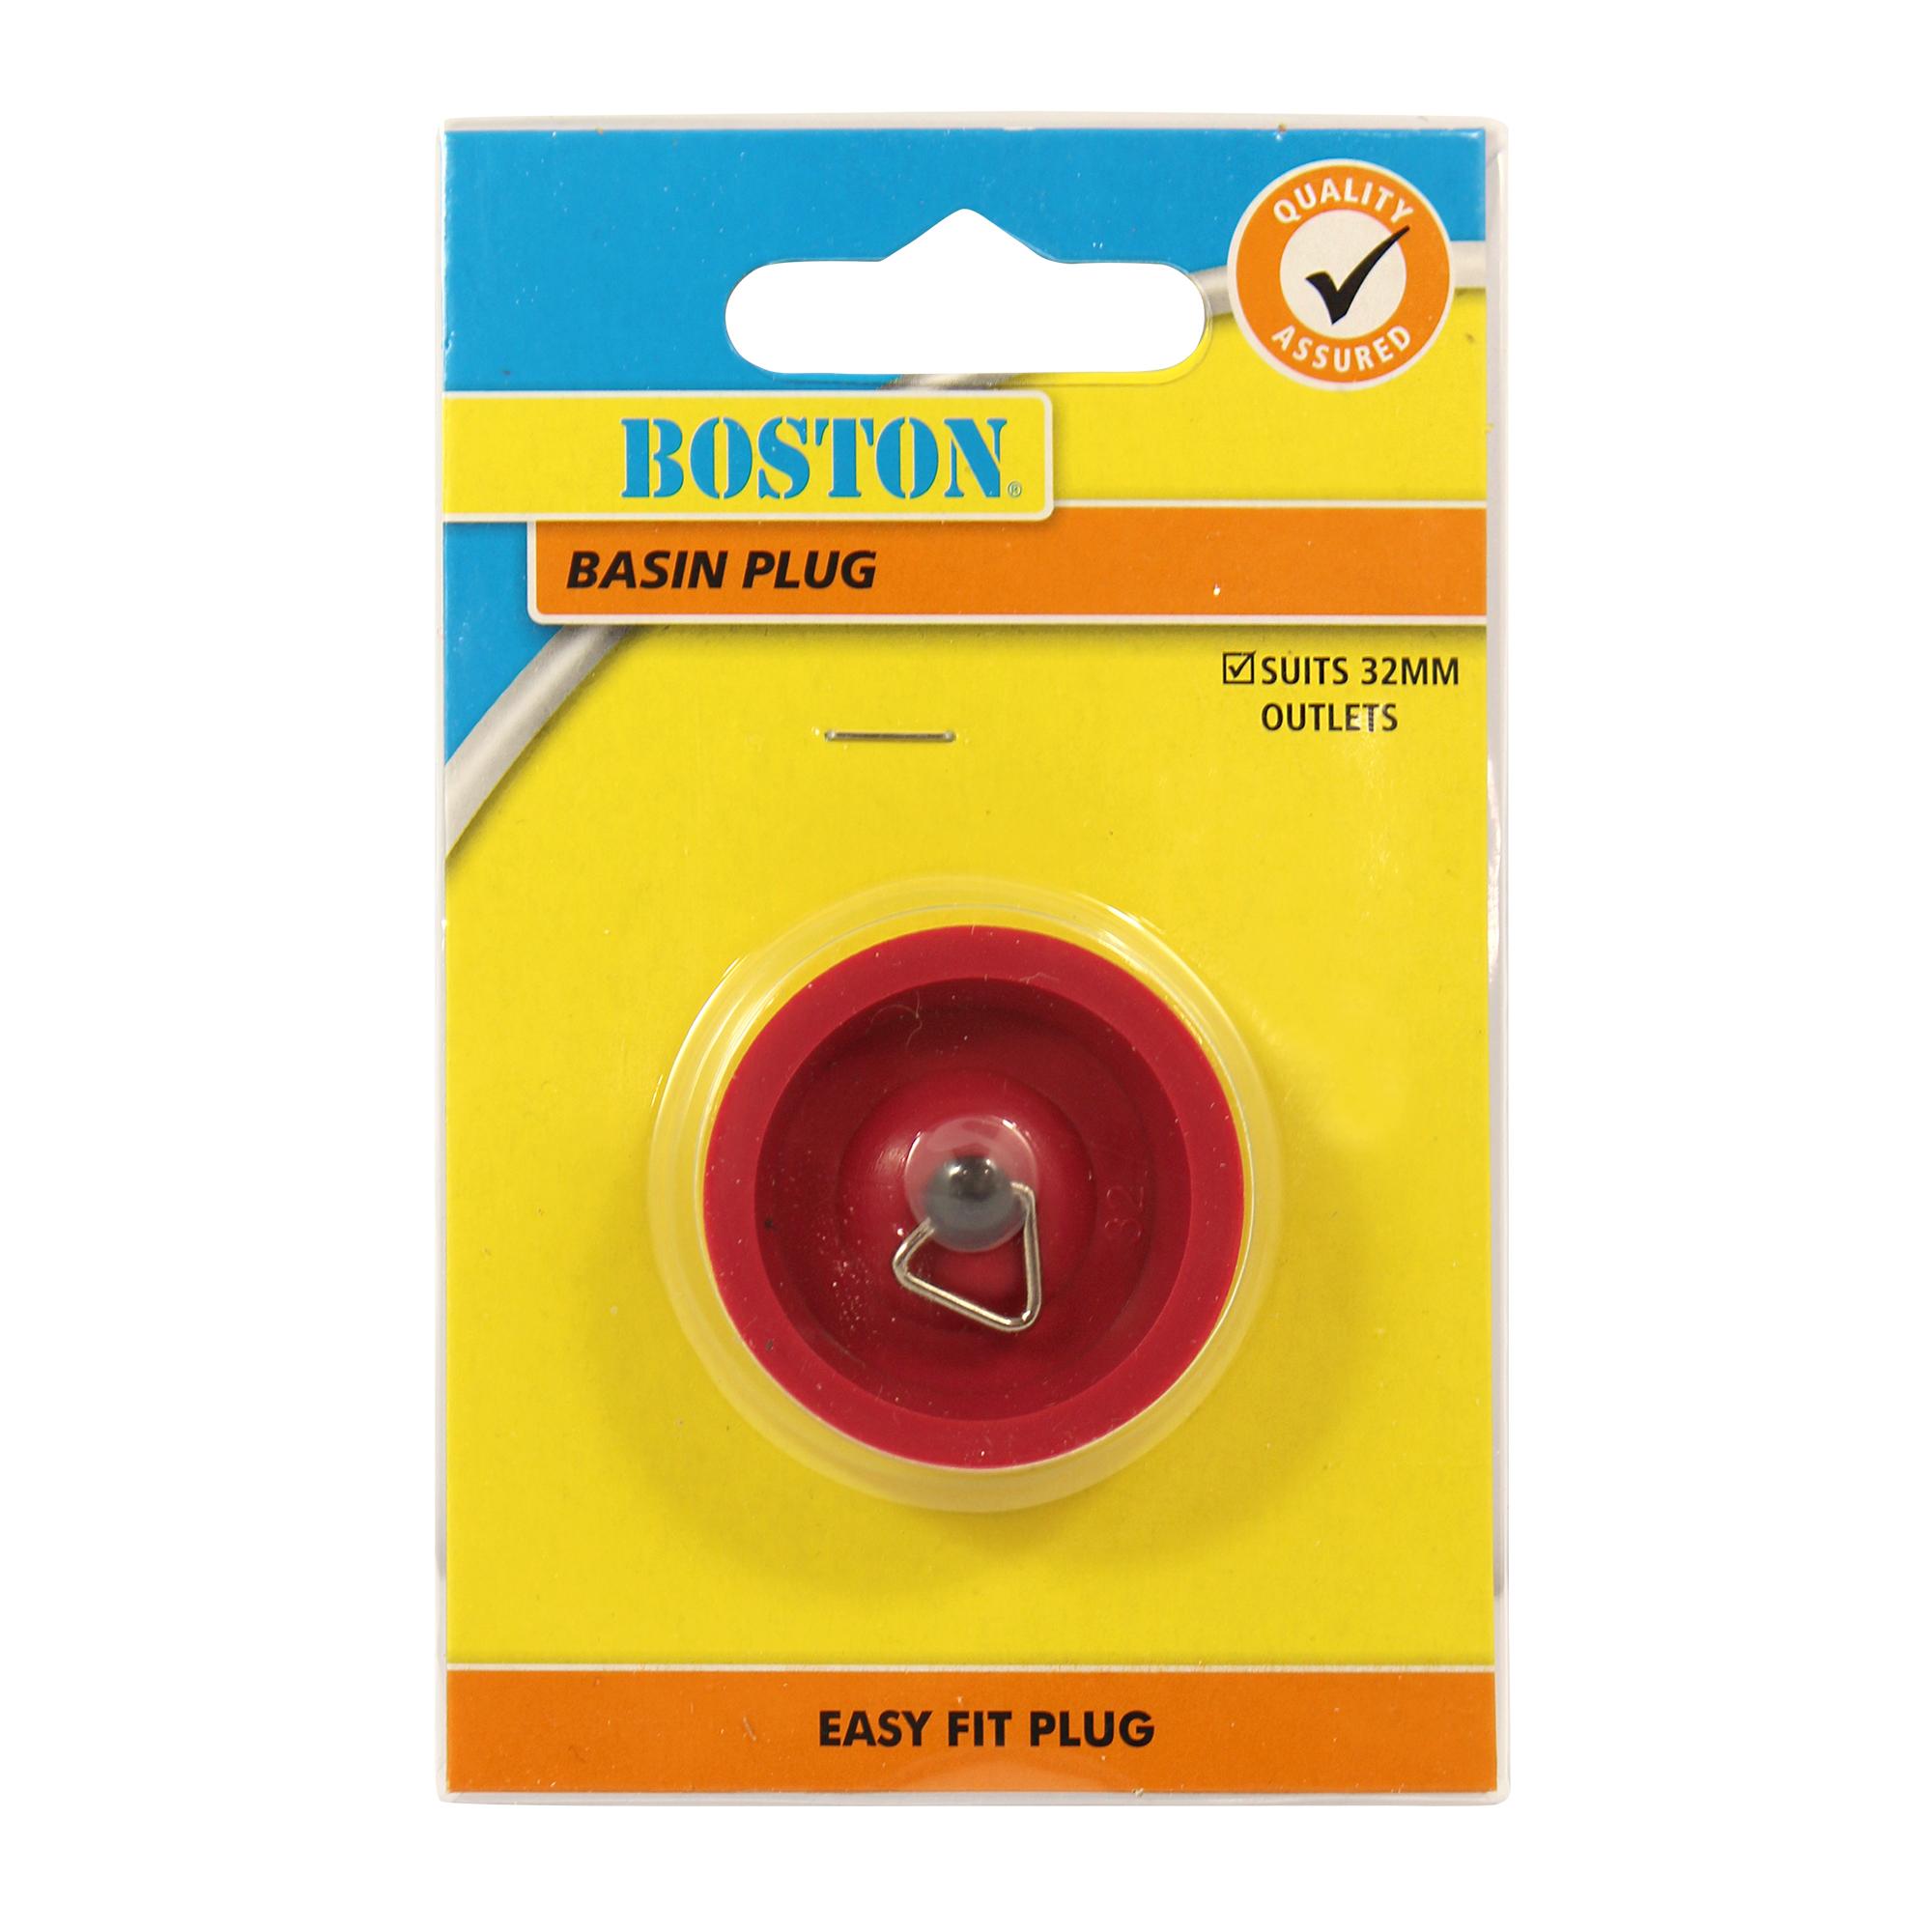 Basin Plug Boston